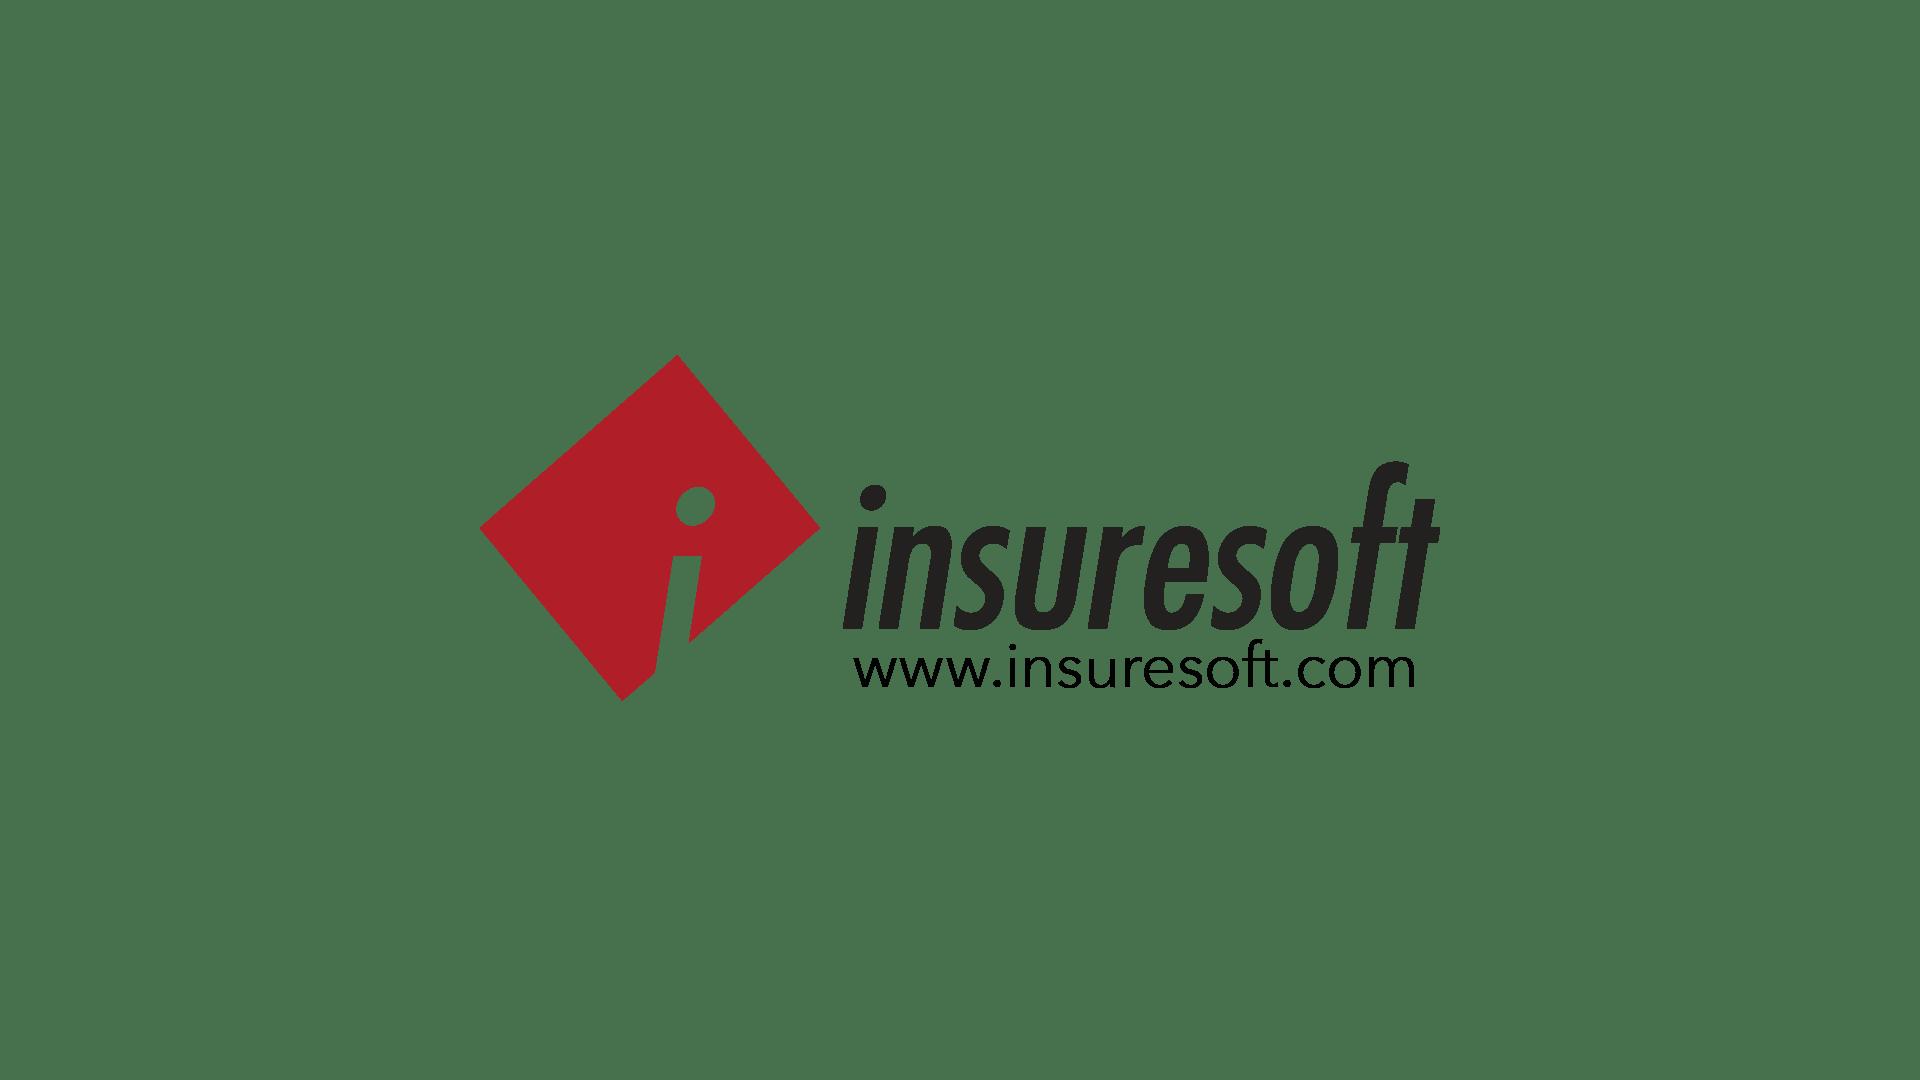 Insuresoft Forms Strategic Alliance with Cloverleaf